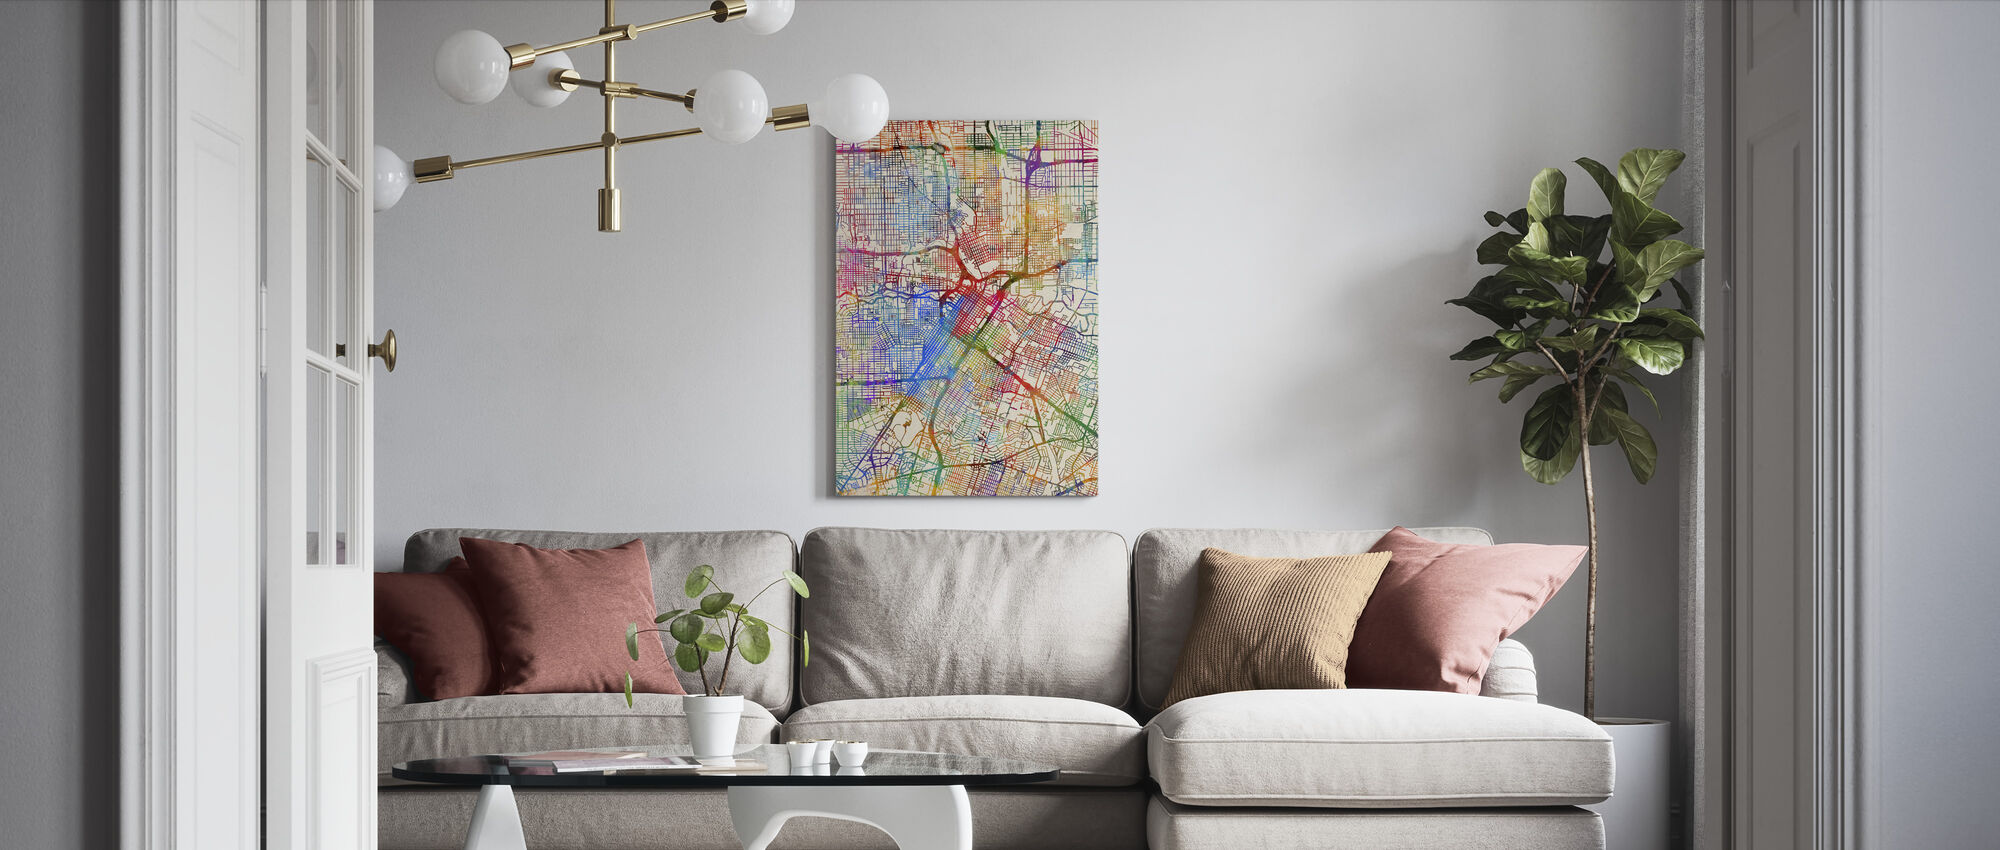 Houston Texas City Street Map - Canvas print - Living Room